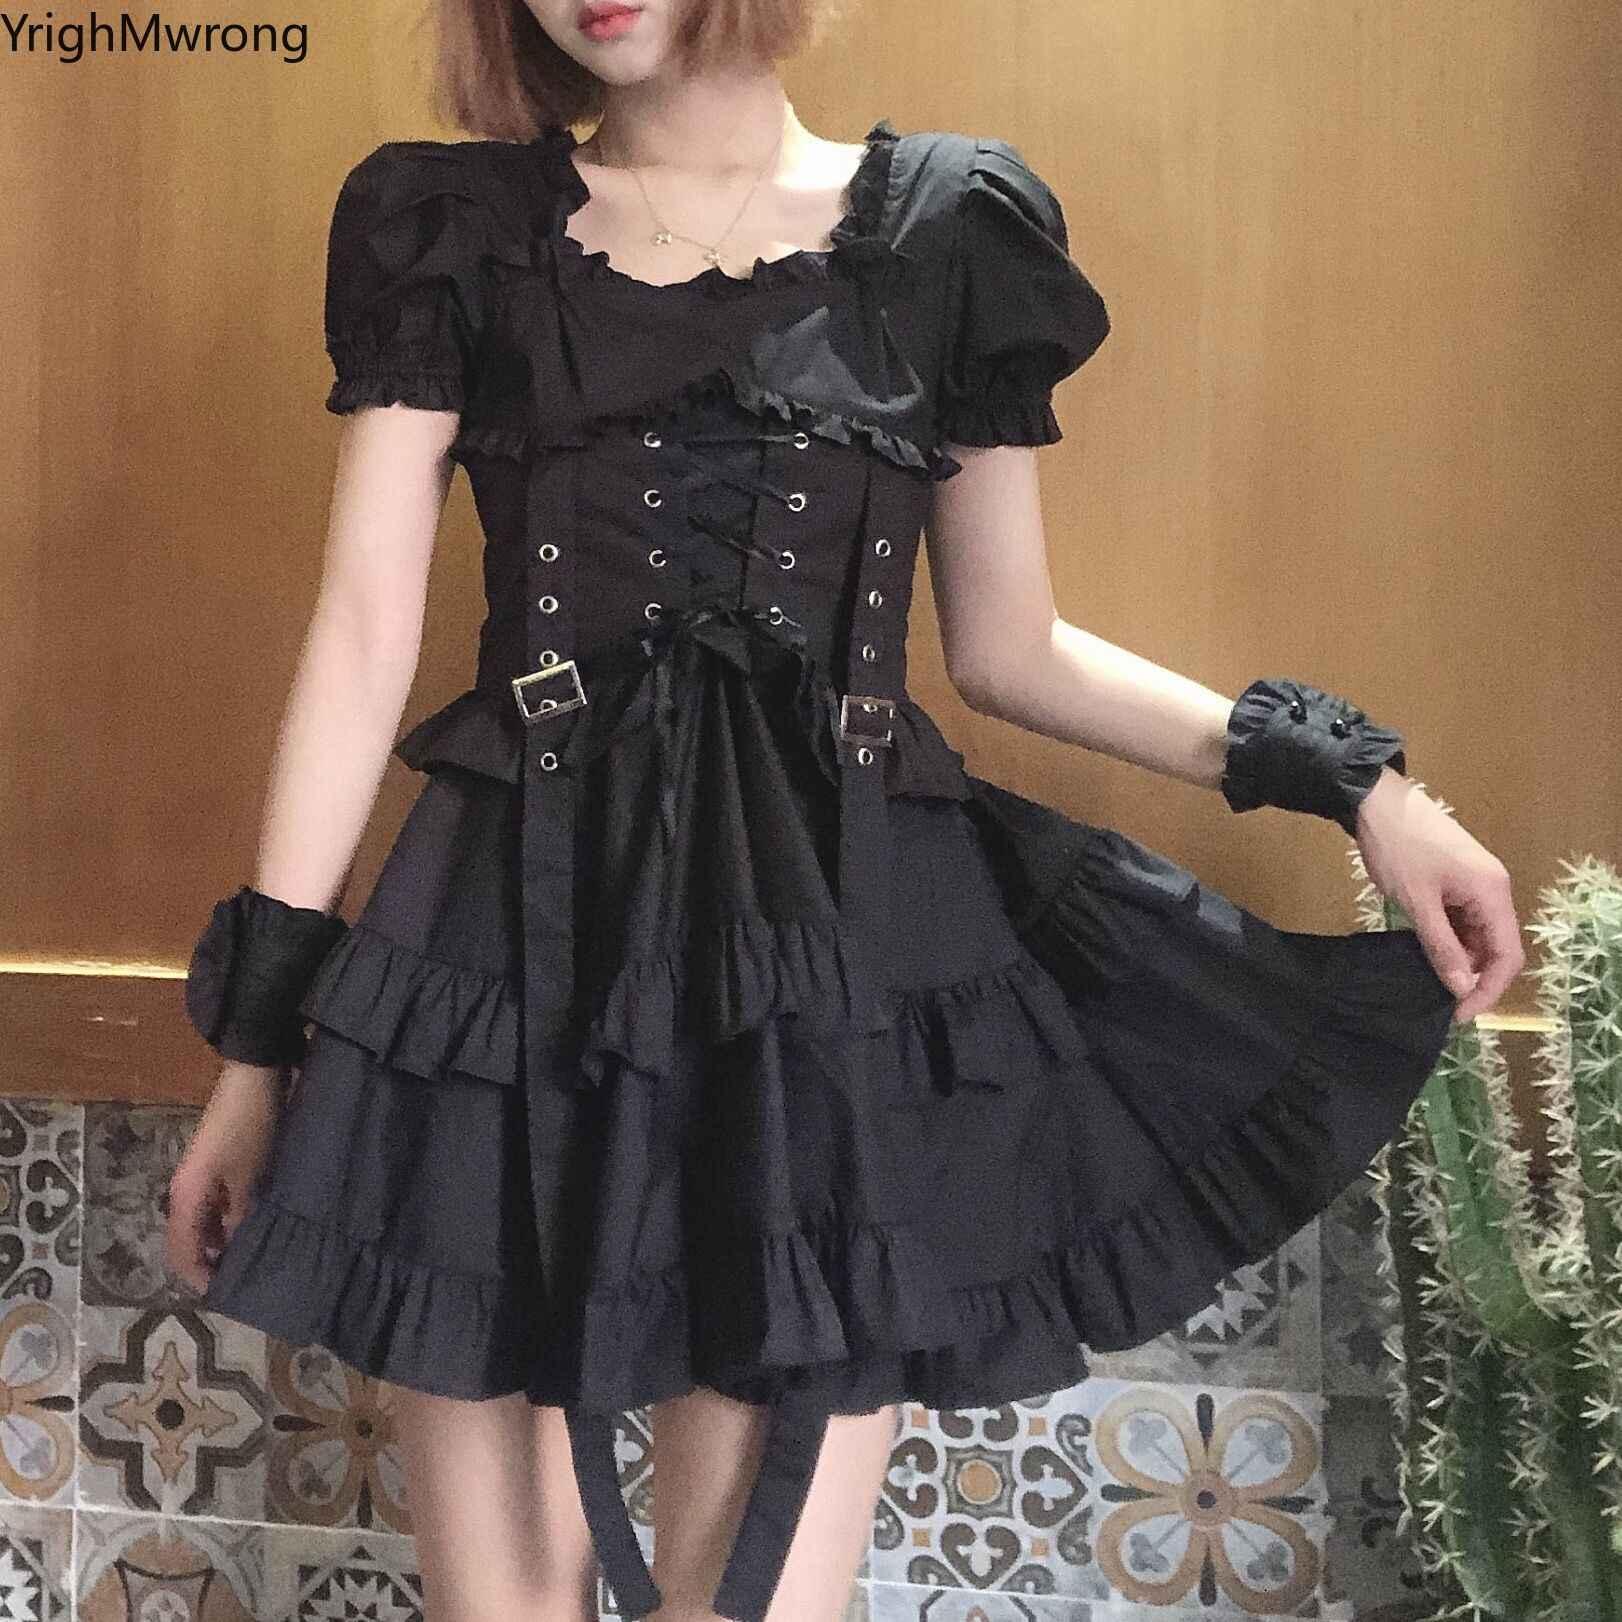 Kawaii Costume Cosplay Costume Gothic Dress Plus Size Gothic Dress Corset Frill Lace Dress Punk Mini Dress Sleeveless Goth Dress